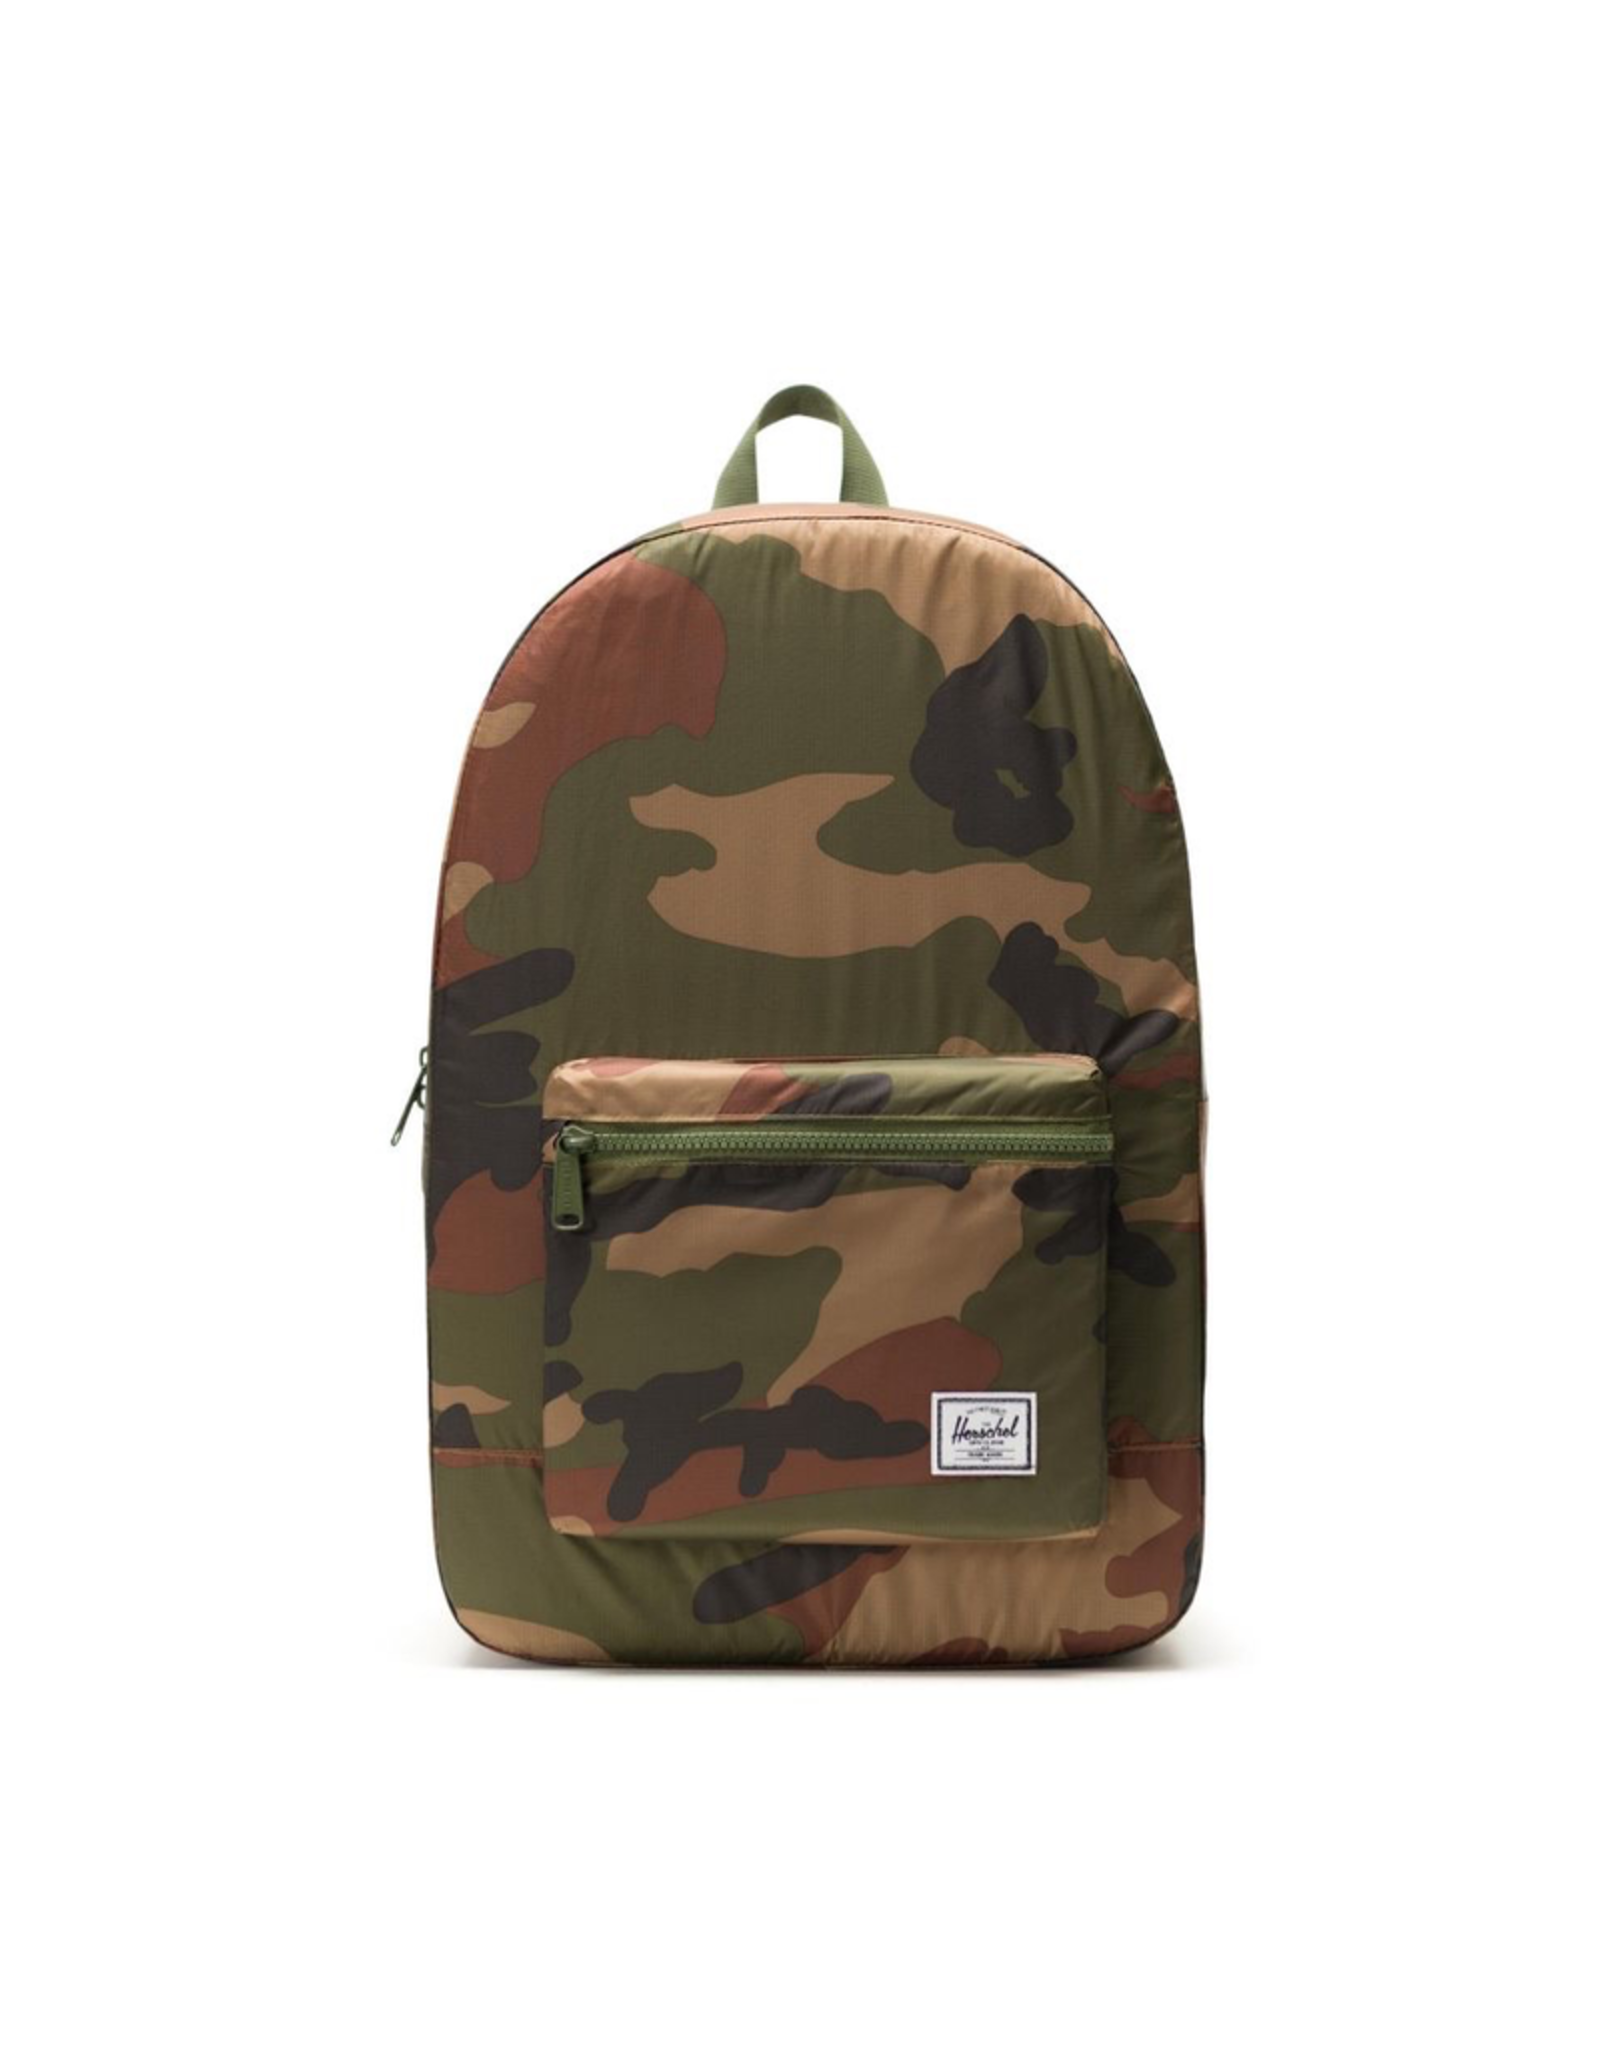 Herschel Supply Co. Adult Packable Daypack, Camo, 24.5L